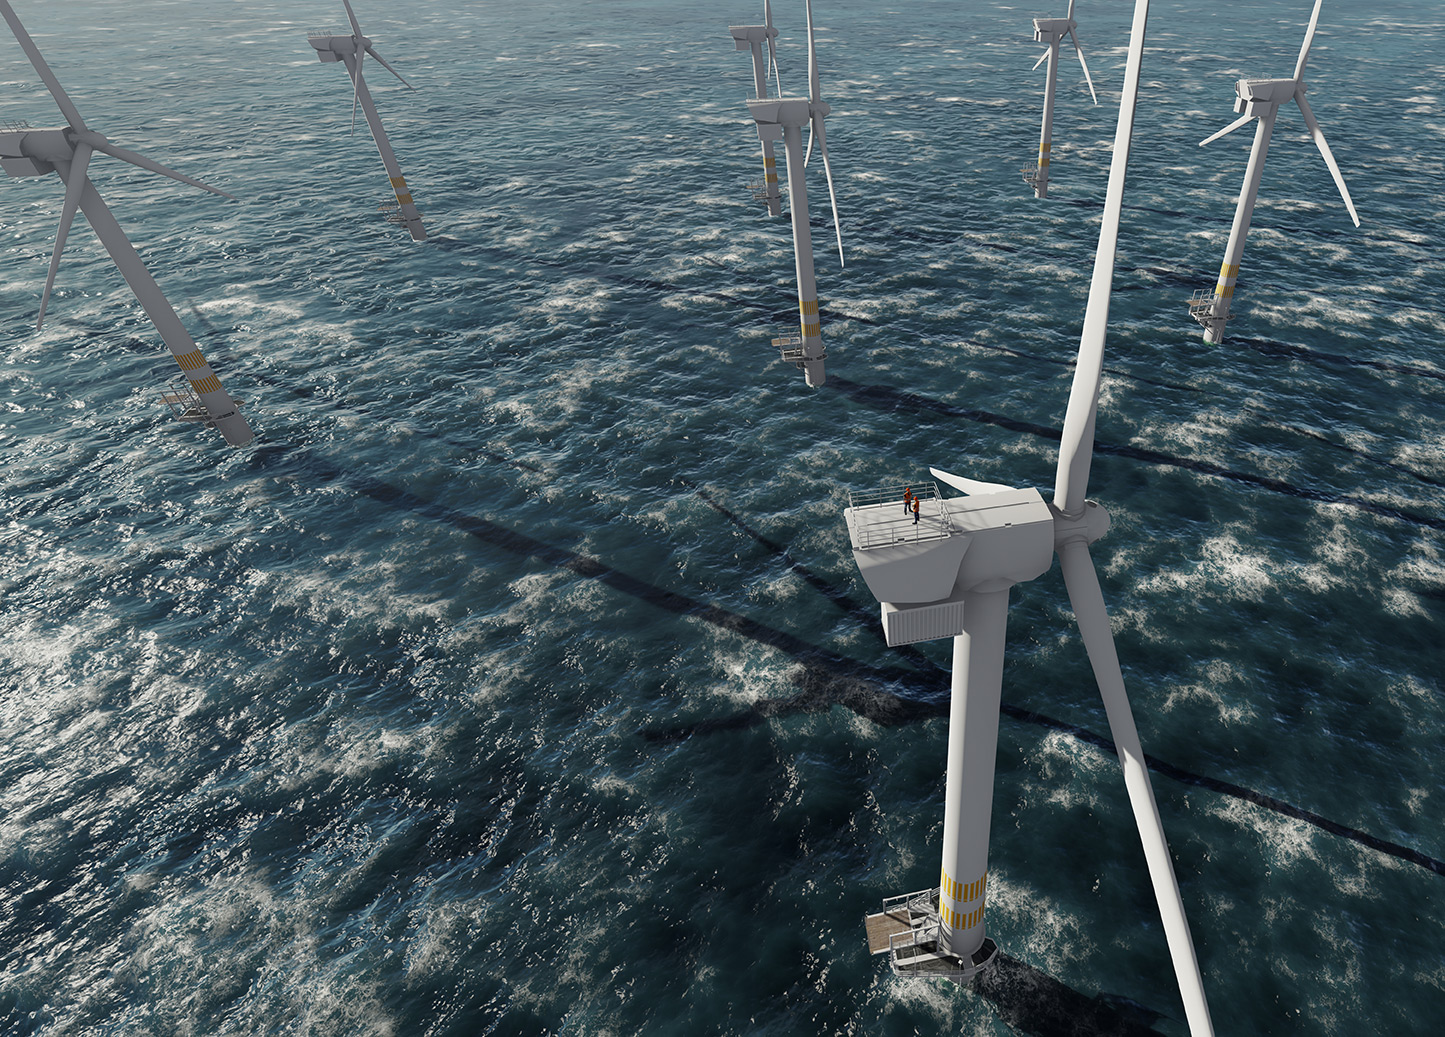 offshore wind farming in new zealand